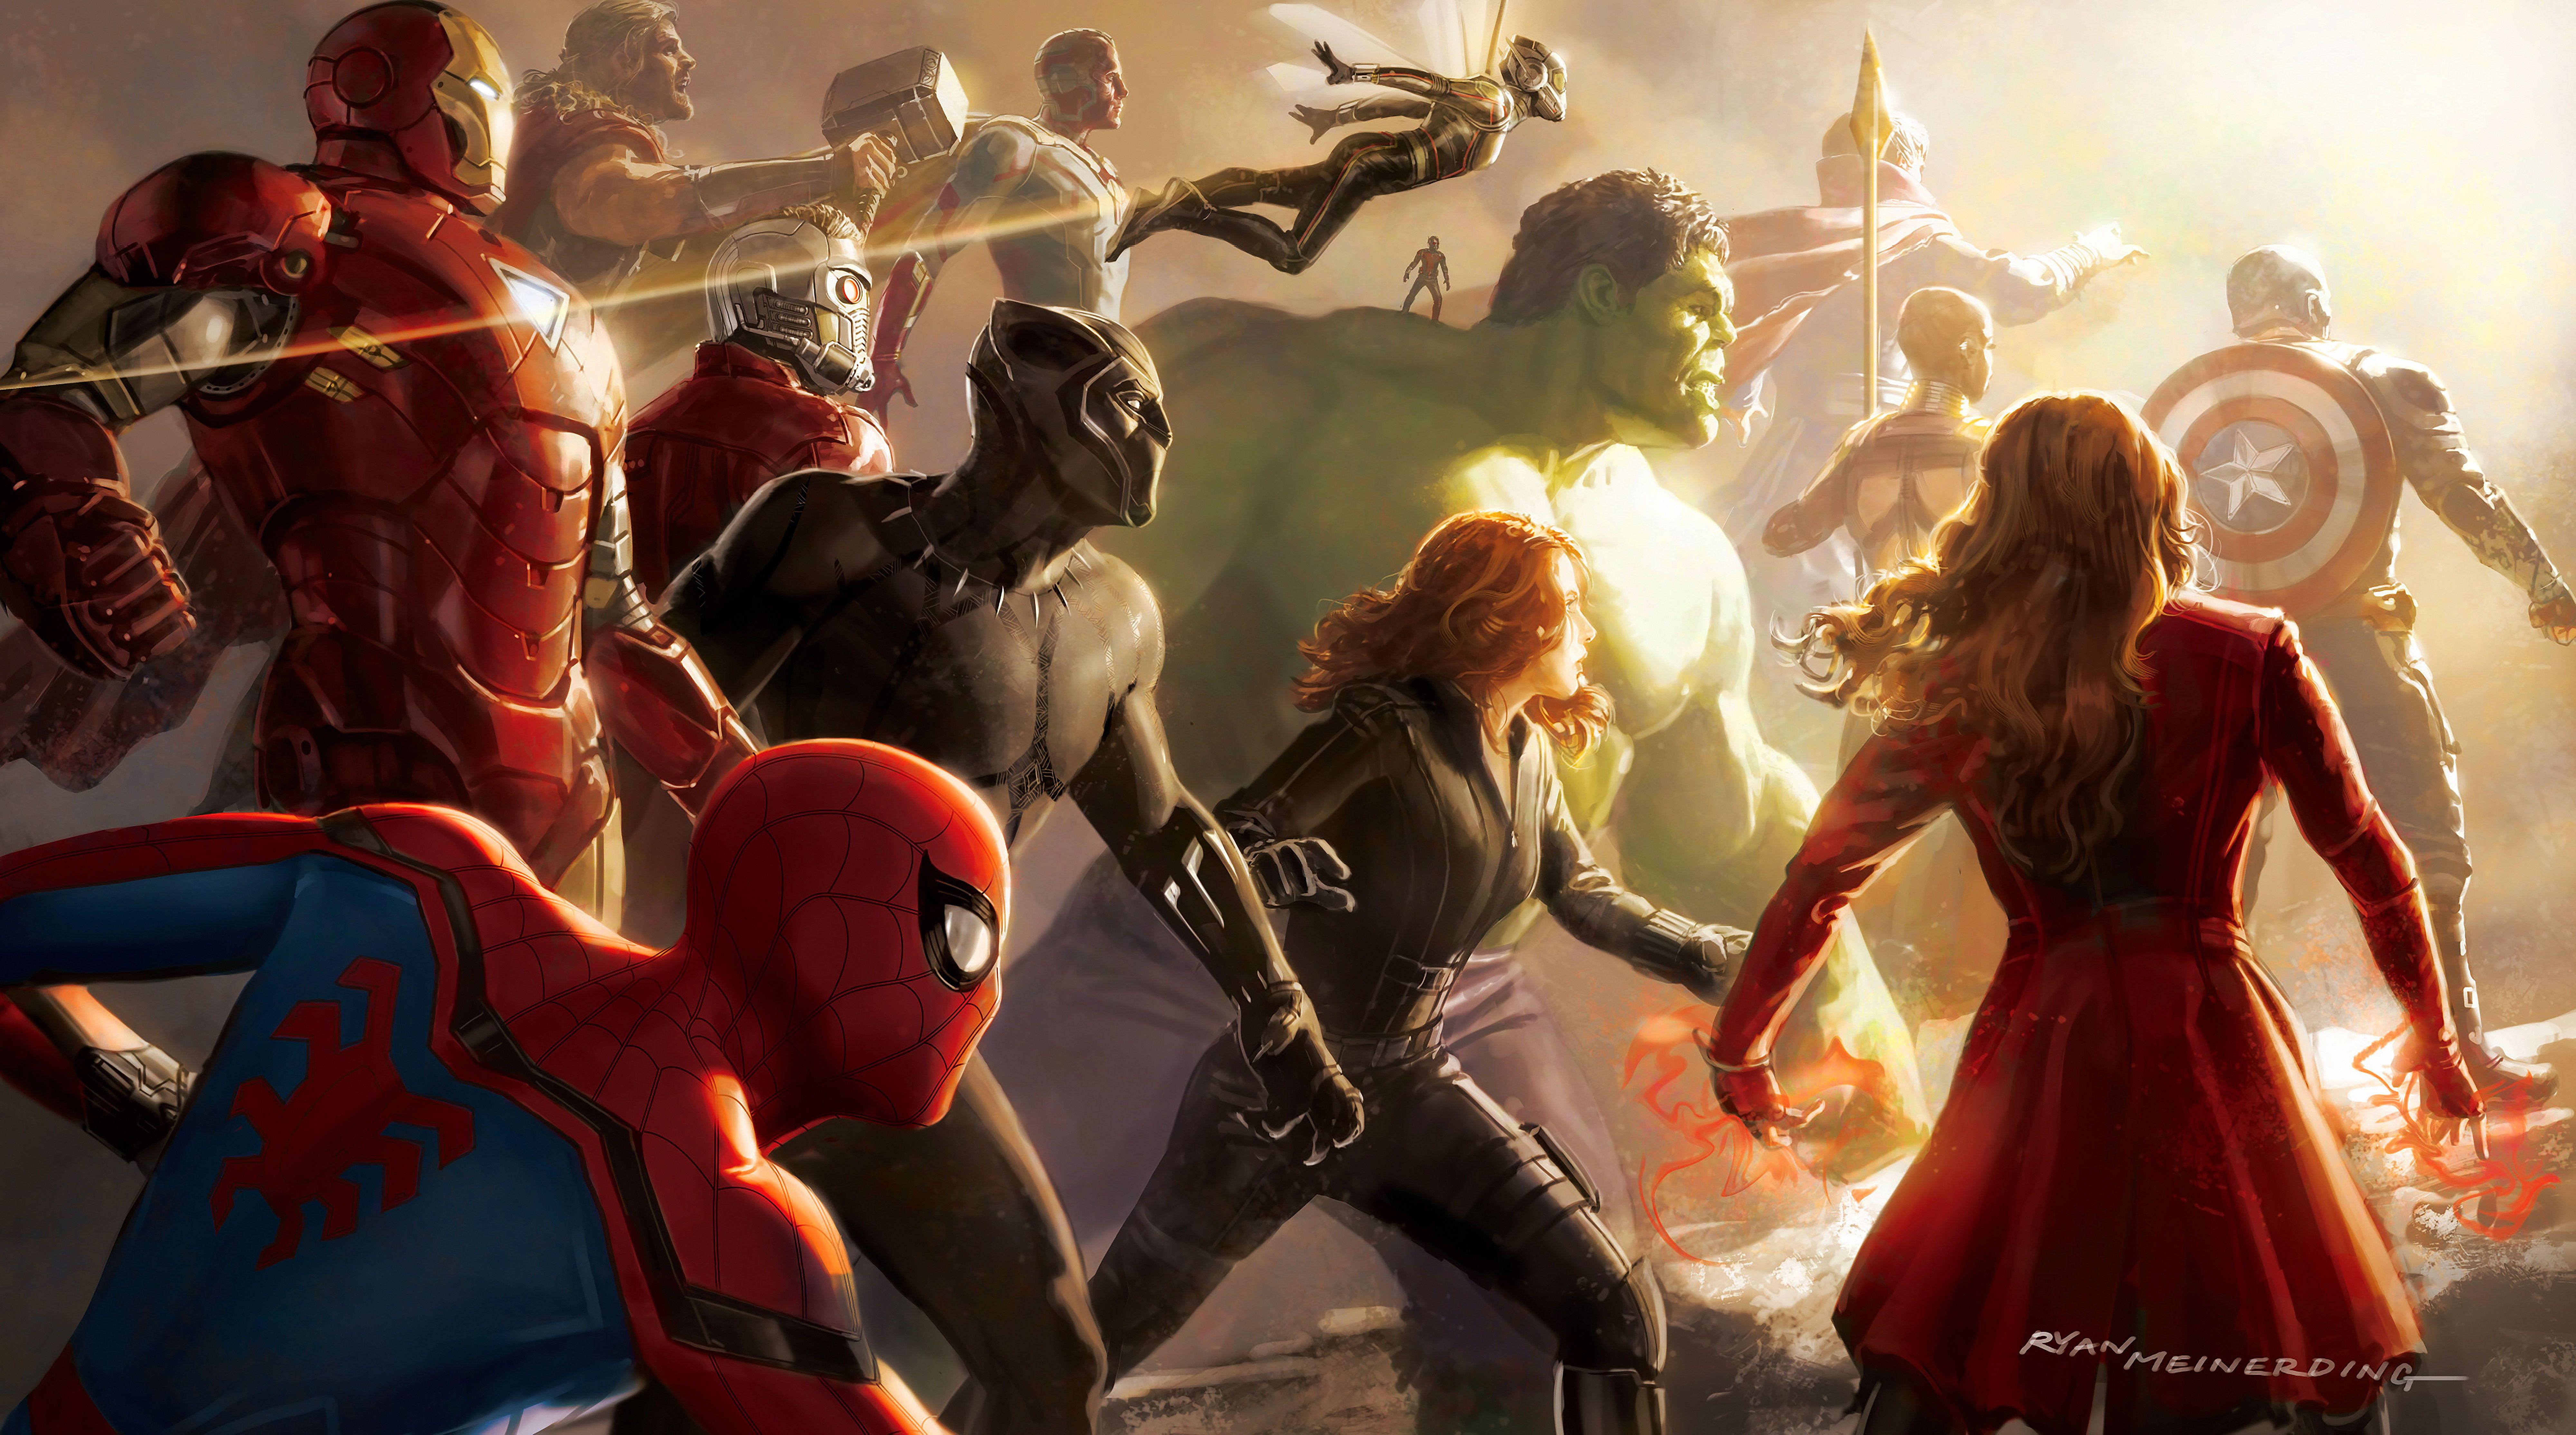 Marvel Cinematic Universe Marvel Comics Iron Man Spider Man Thor Black Widow The Avengers Captain America Avengers Wallpaper Marvel Avengers Funny Avengers